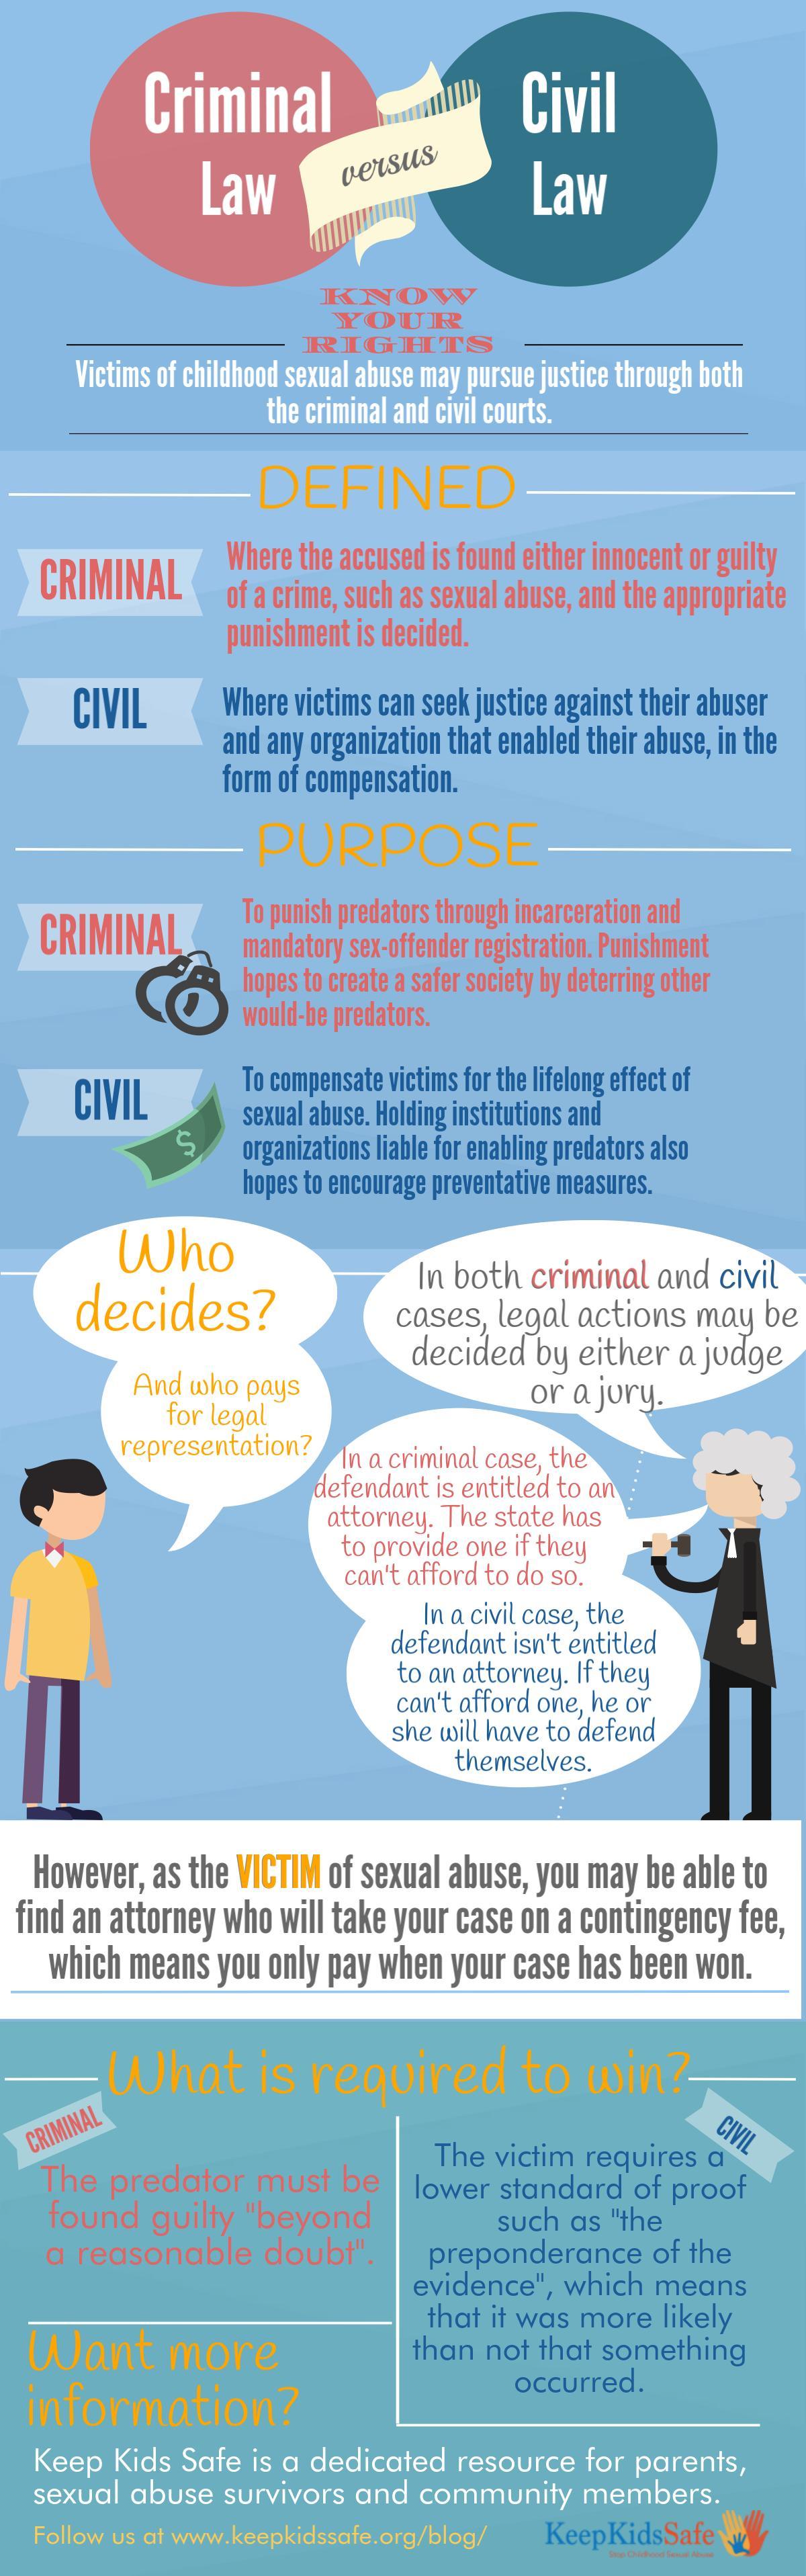 Infographic Criminal versus Civil law